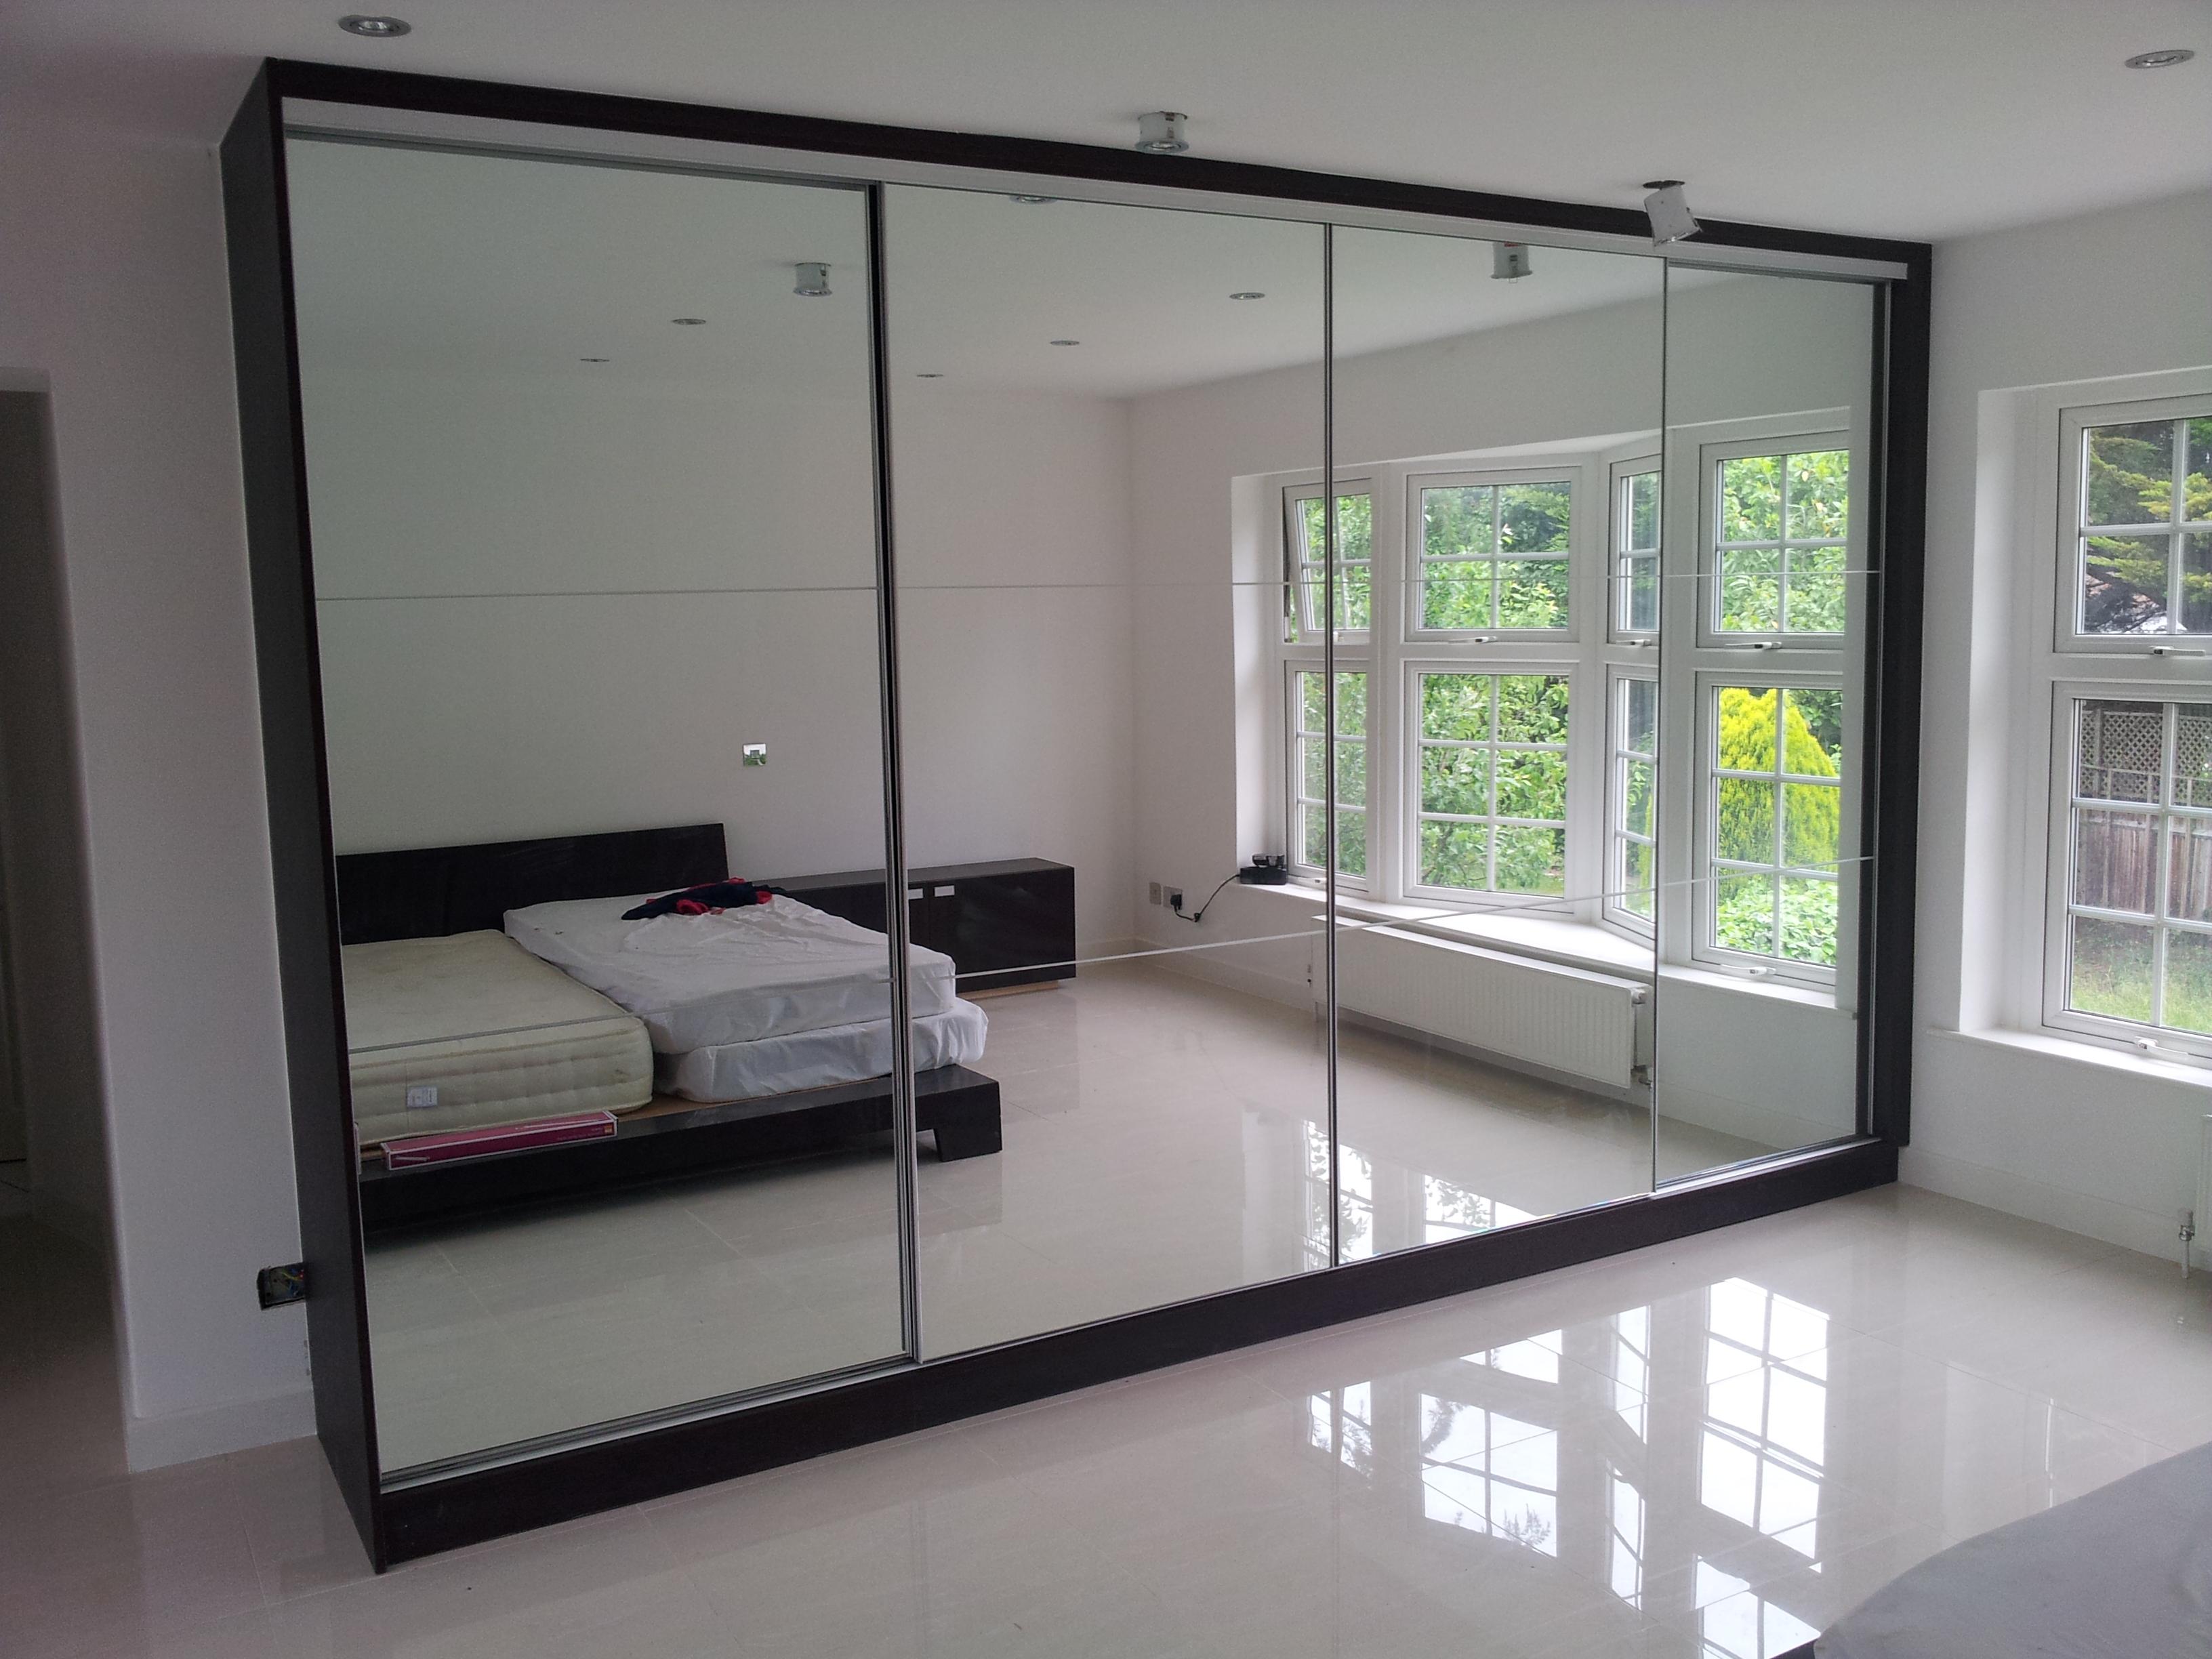 doors products forza lema furniture product wardrobe sliding brand